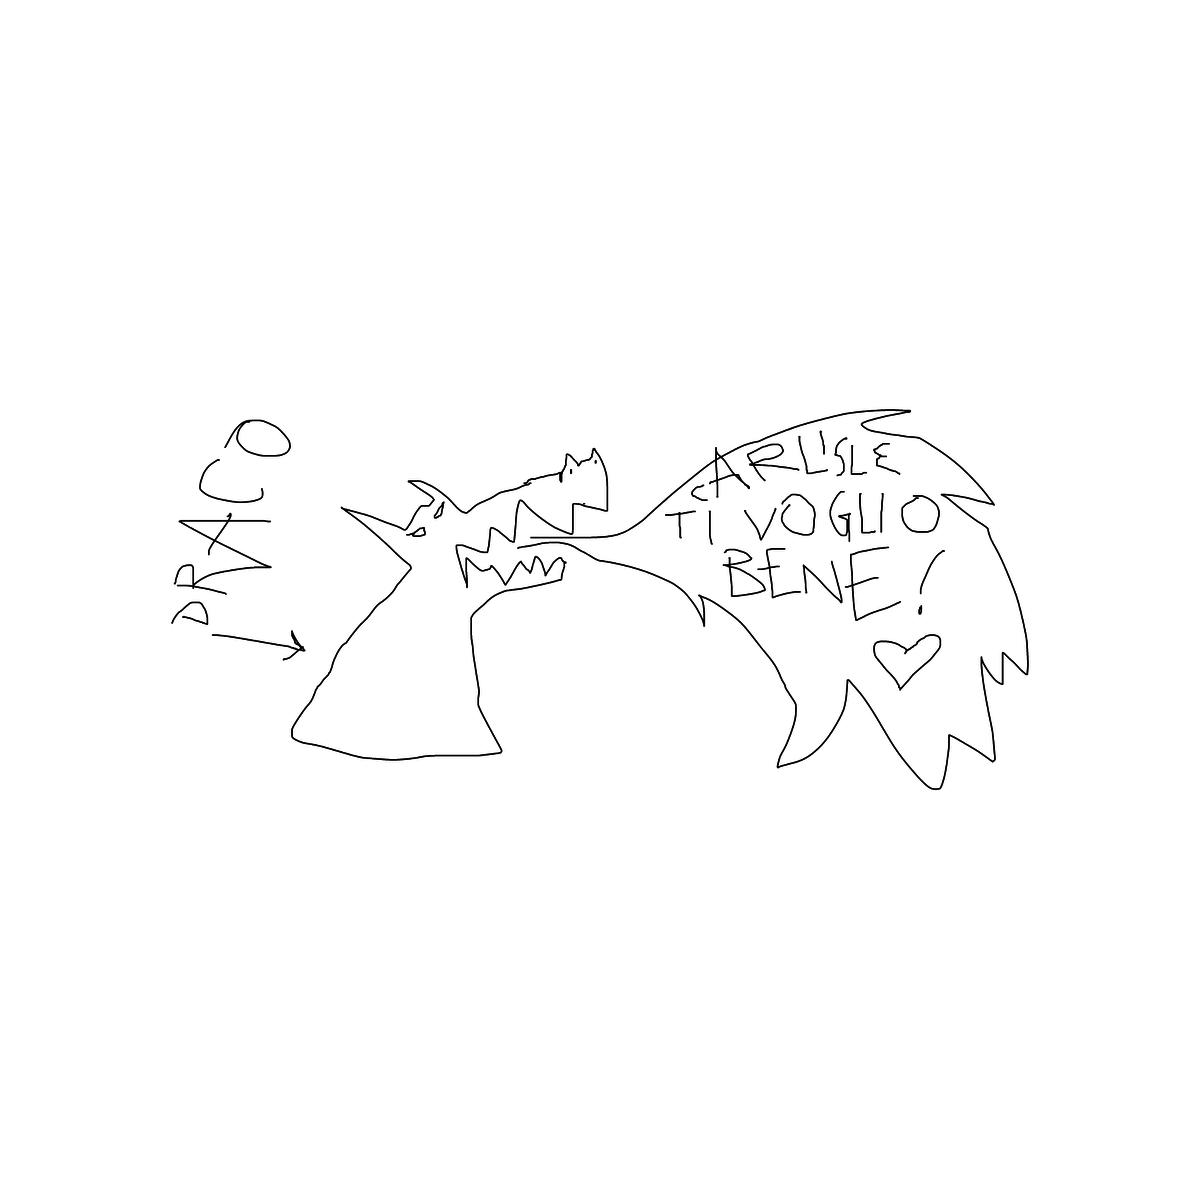 BAAAM drawing#17388 lat:54.8944053649902340lng: -2.9357752799987793